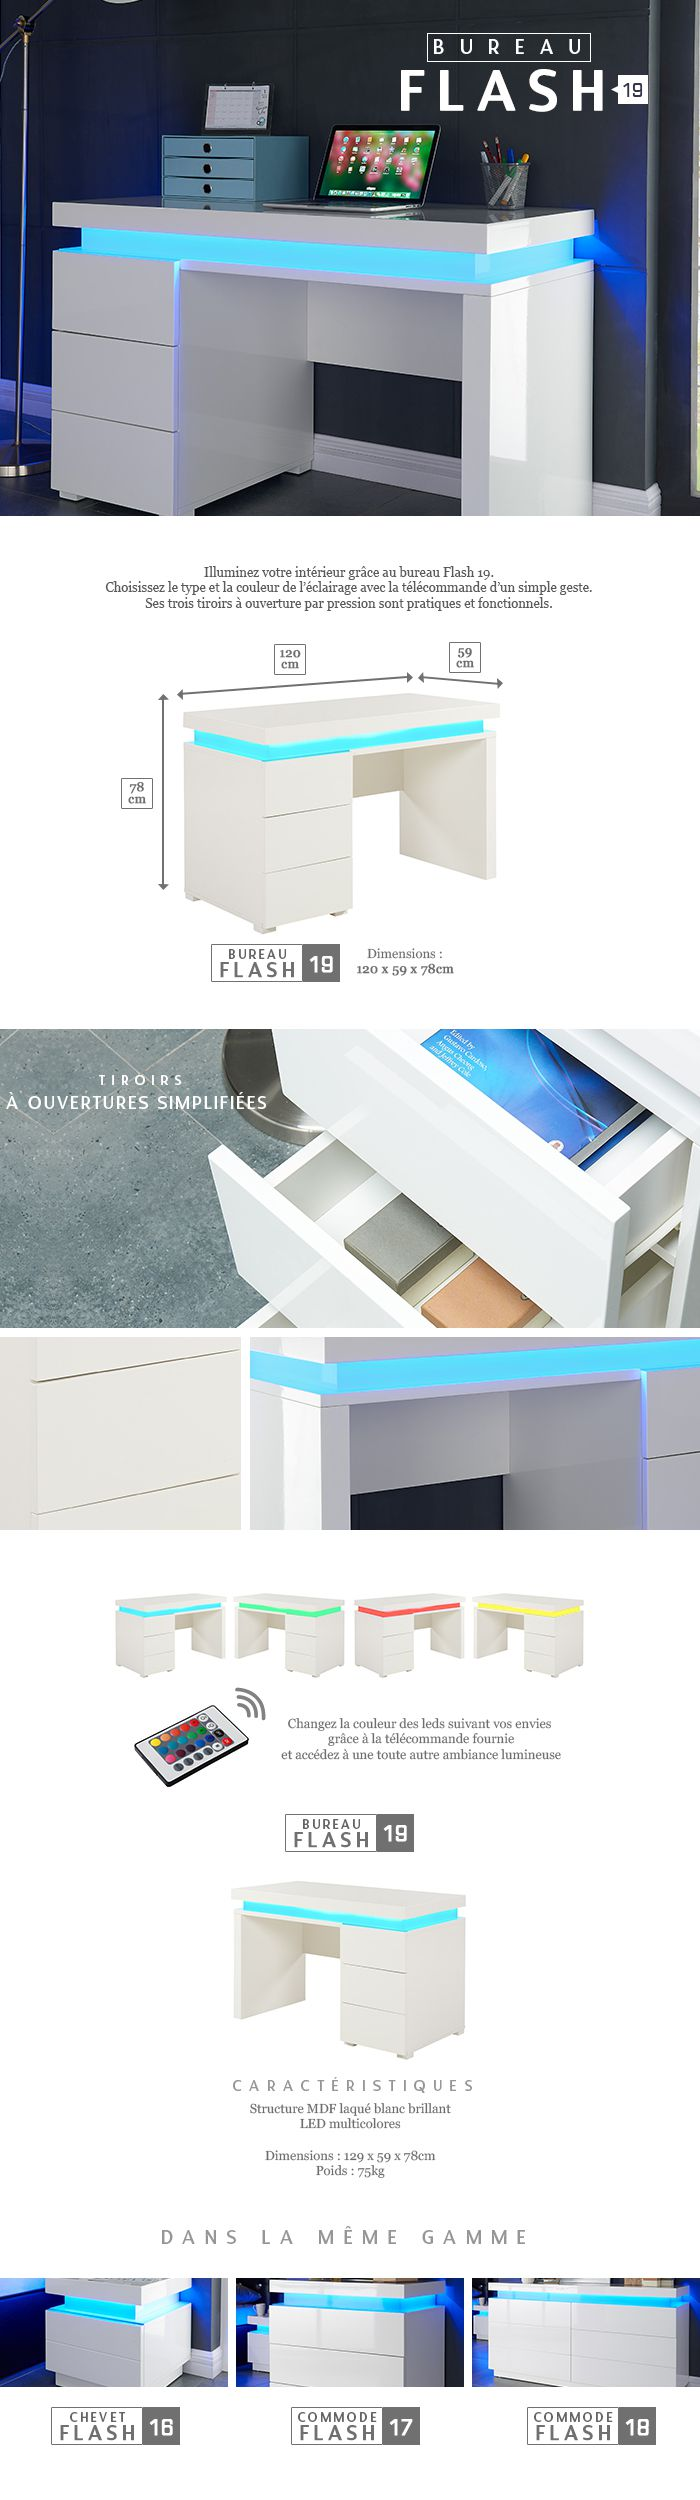 Flash Bureau Contemporain Blanc Brillant L 120 Cm Achat Vente